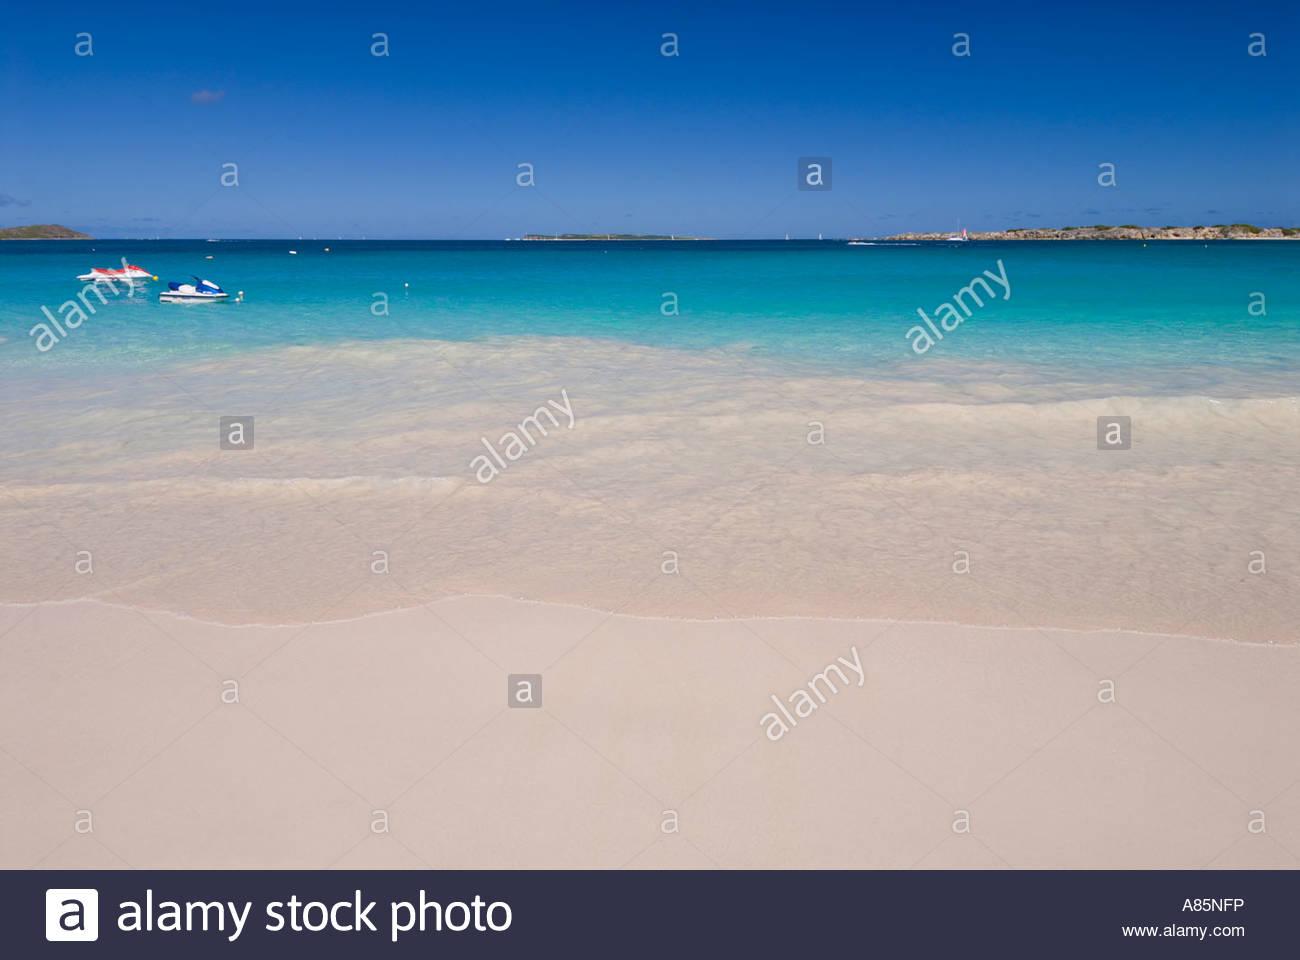 Baie Orientale, Saint Martin, French Antilles, Caribbean - Stock Image